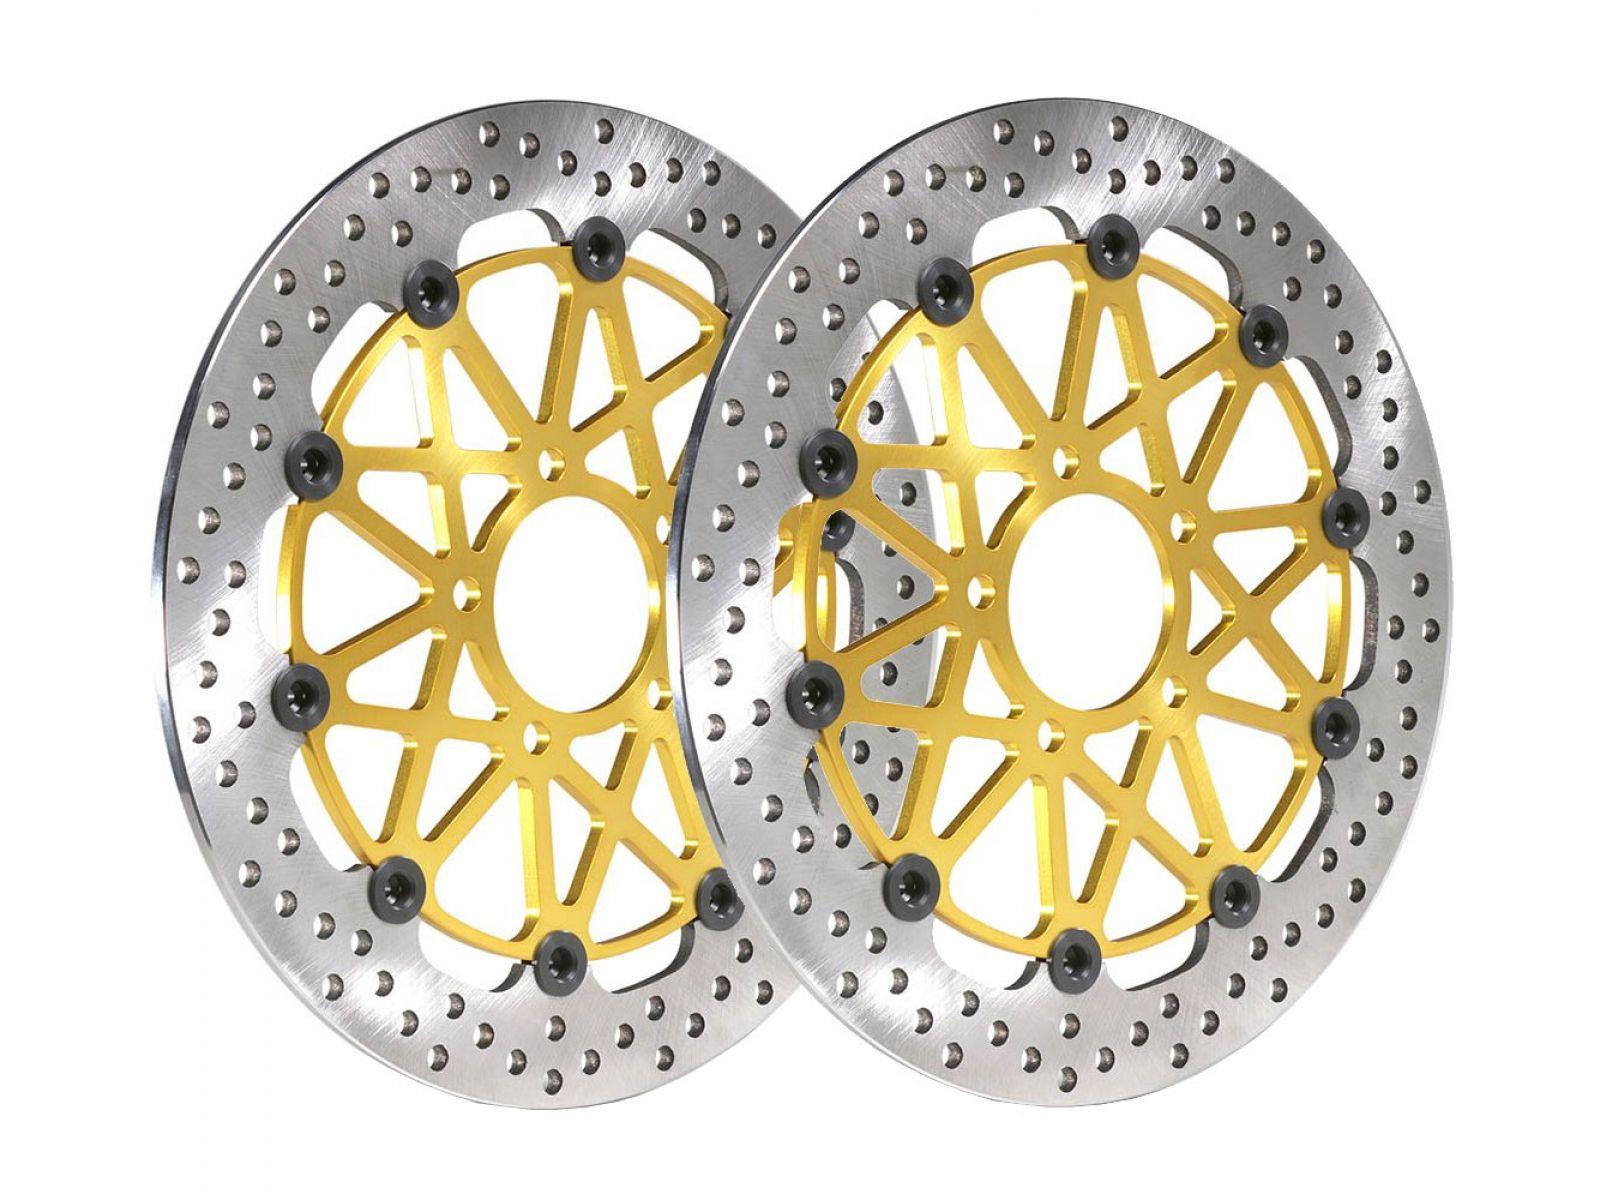 Диски тормозные передние Brembo Super Sport для Ducati 1098 07-11, Panigale 1199 12-15, Panigale 1299 12-15, Superleggera 14-16